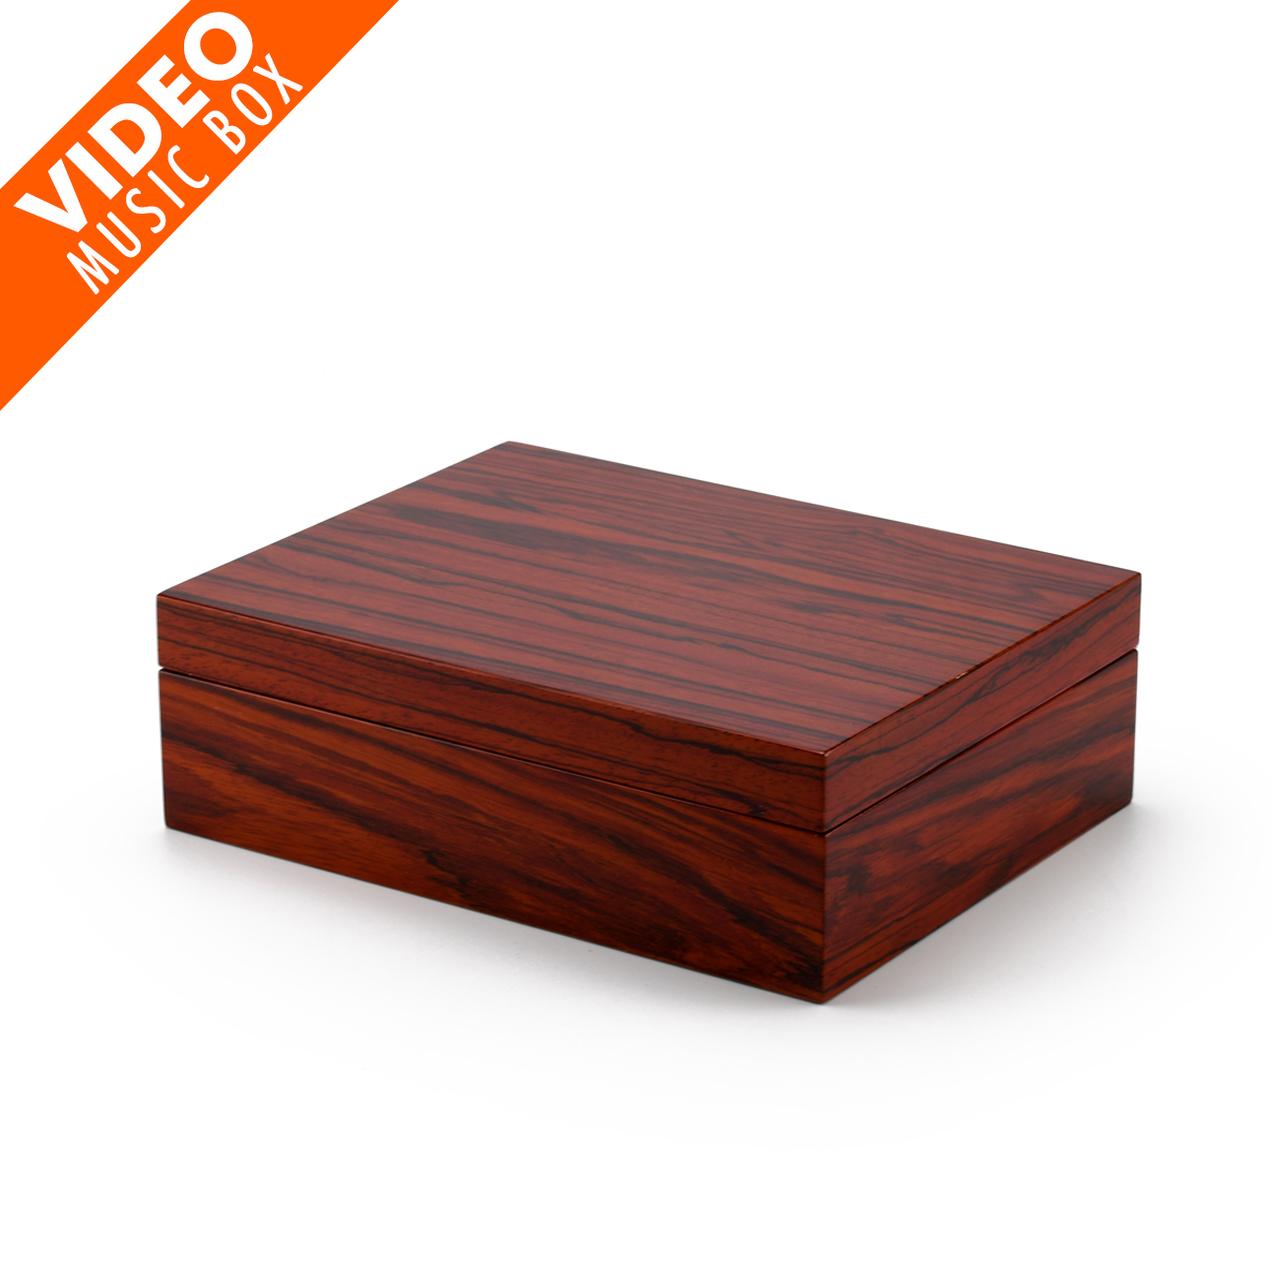 Ultra-Sleek 18 Note Hi Gloss Zebra Striped Wood Finish 7 LCD Video Music Jewelry Box